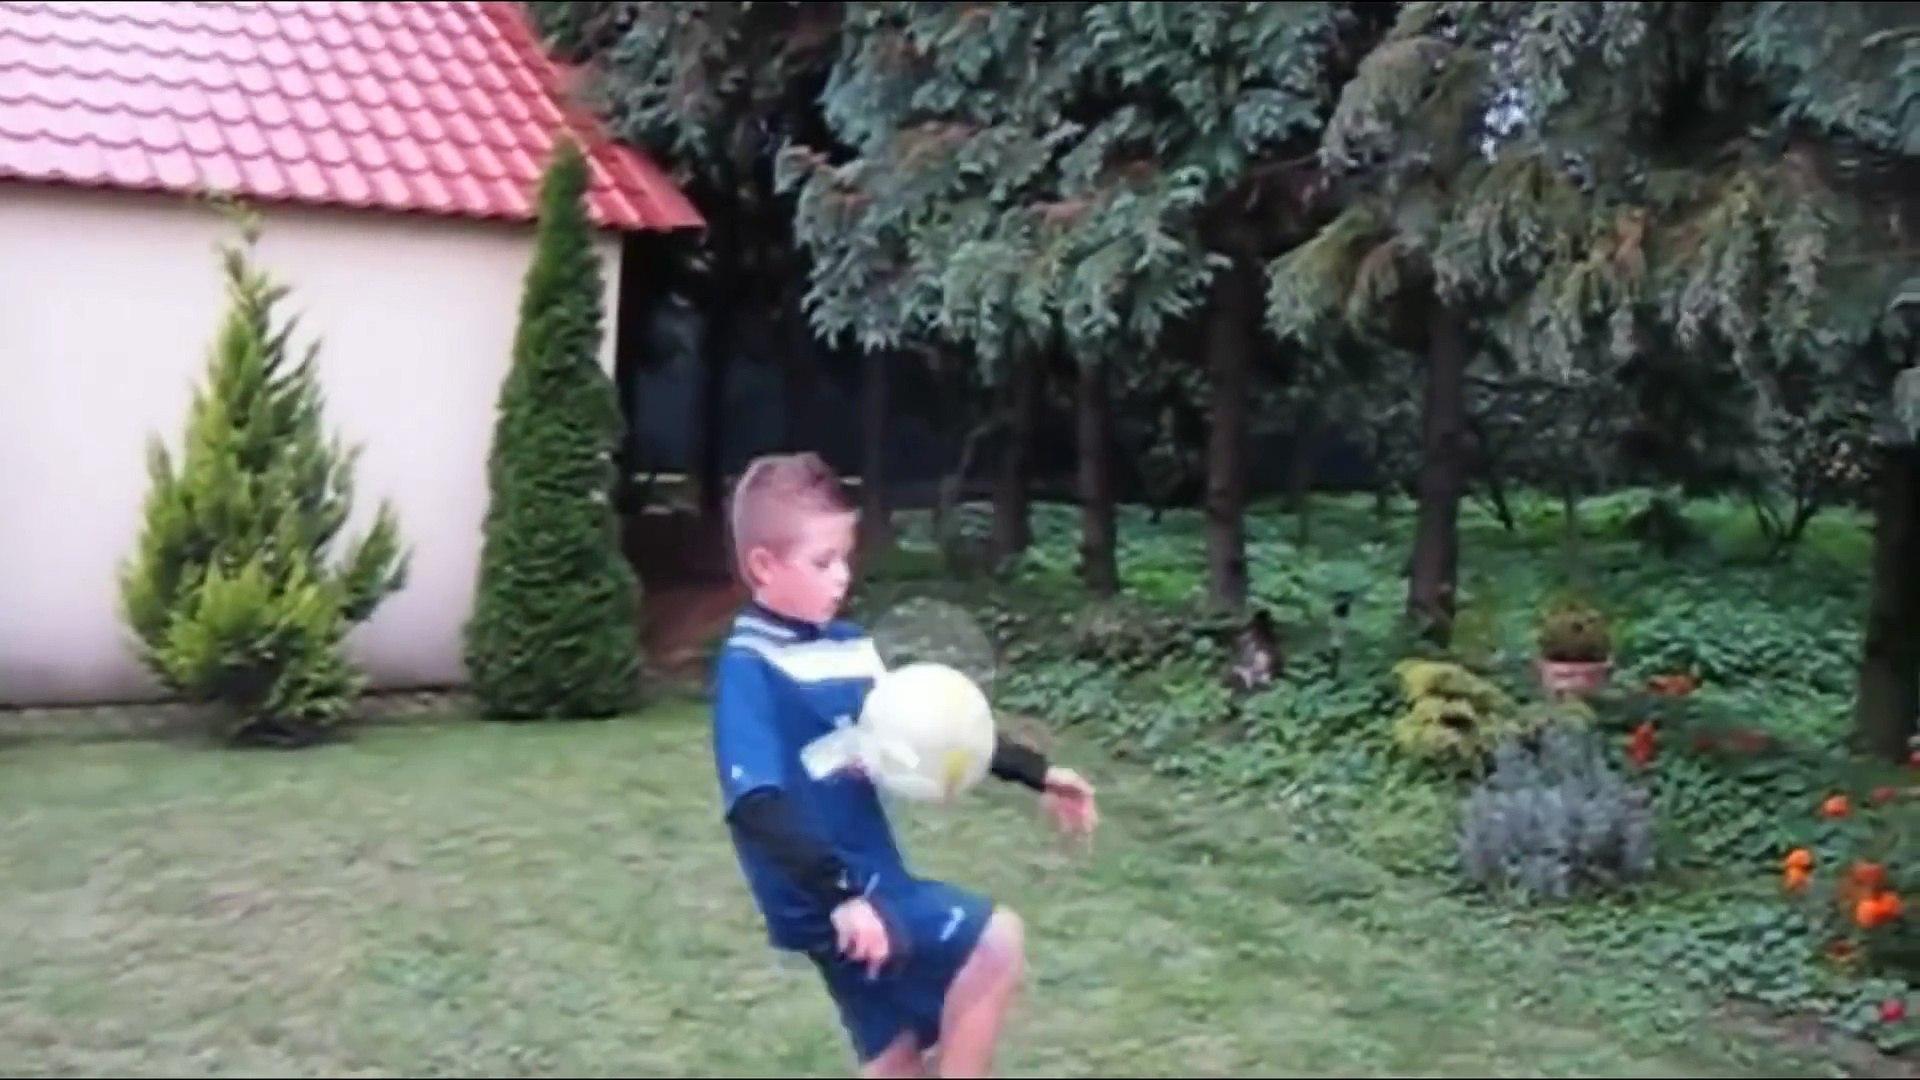 Lộ clip Ronaldo quay con trai bằng IPHONE 6-The Ronaldo movie clip turns son with IPHONE 6